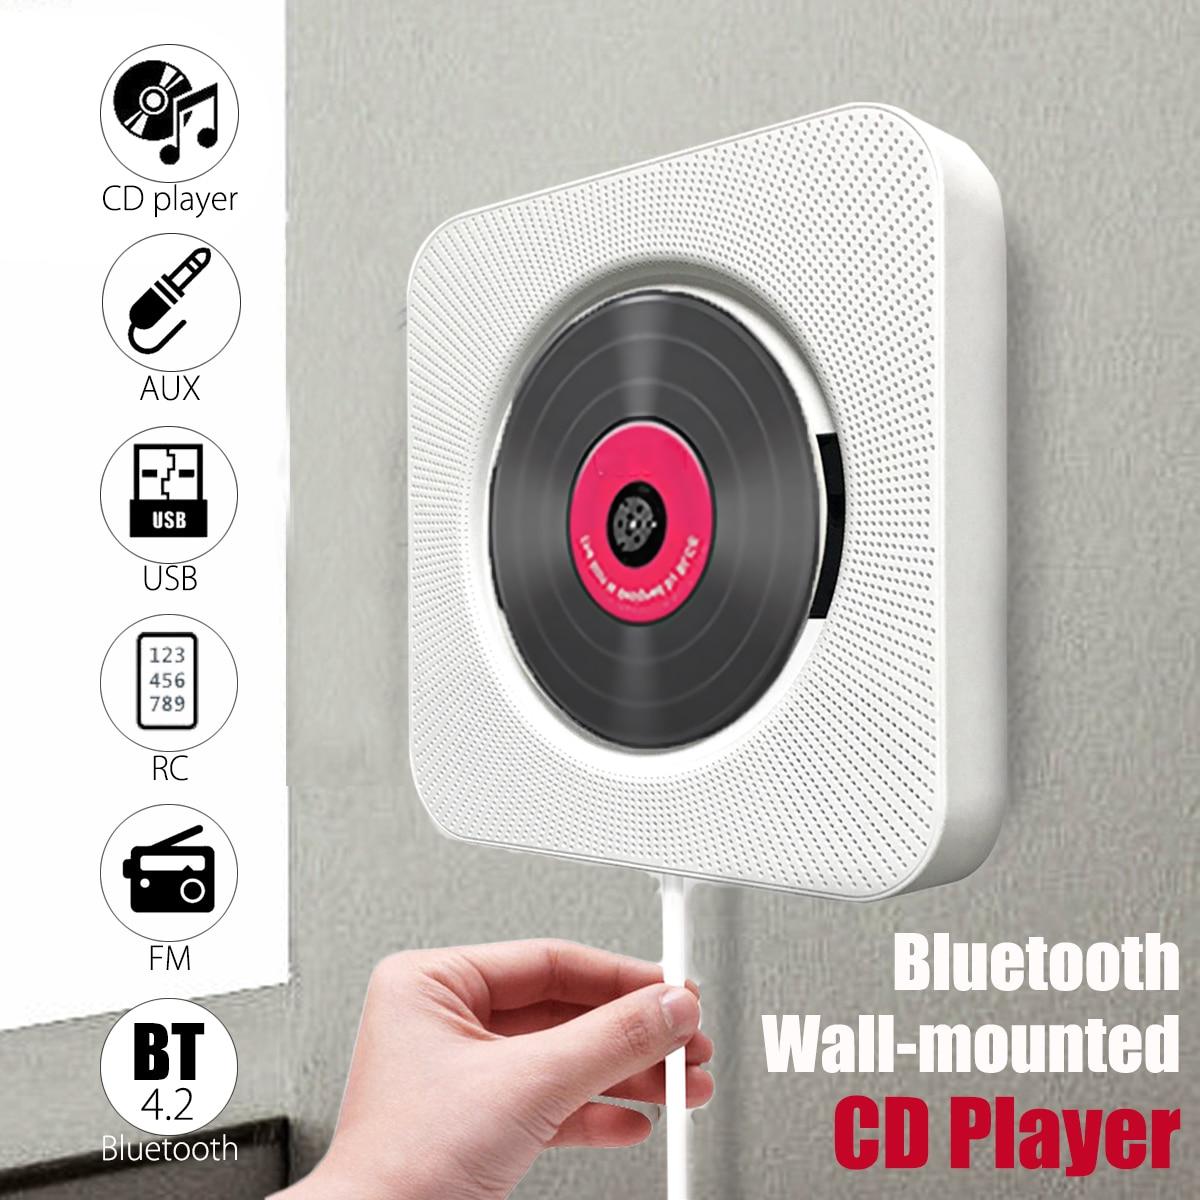 KINCO Wall Mountable CD Player HiFi CD Music Player bluetooth Speaker with Remote Control FM Radio USB MP3